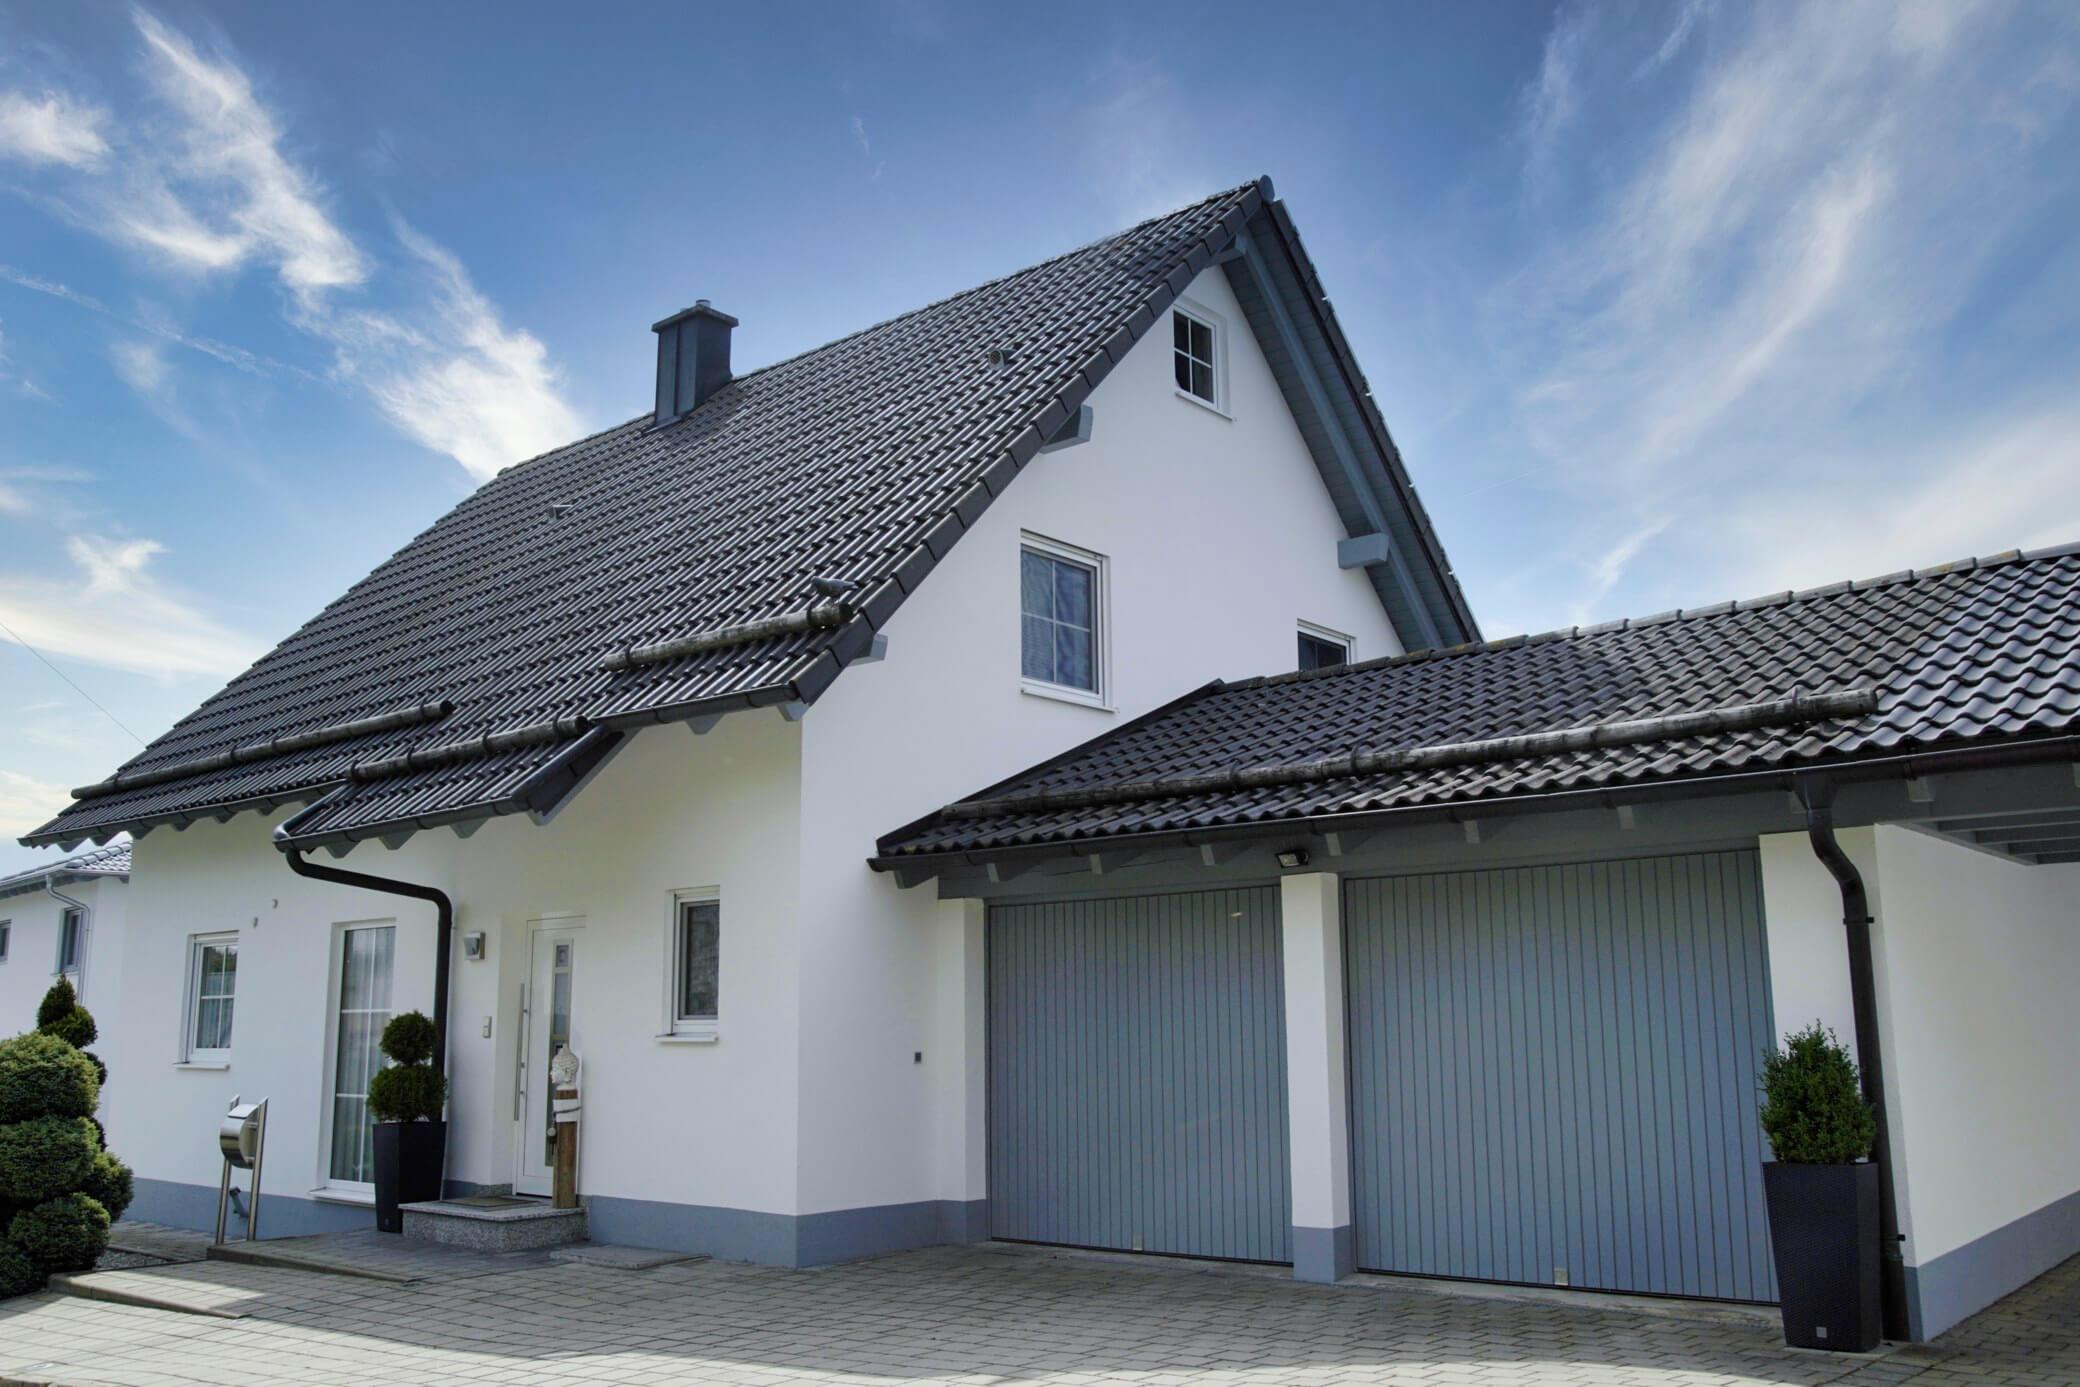 K&K Bau GmbH Massivhaus Referenzbild 22